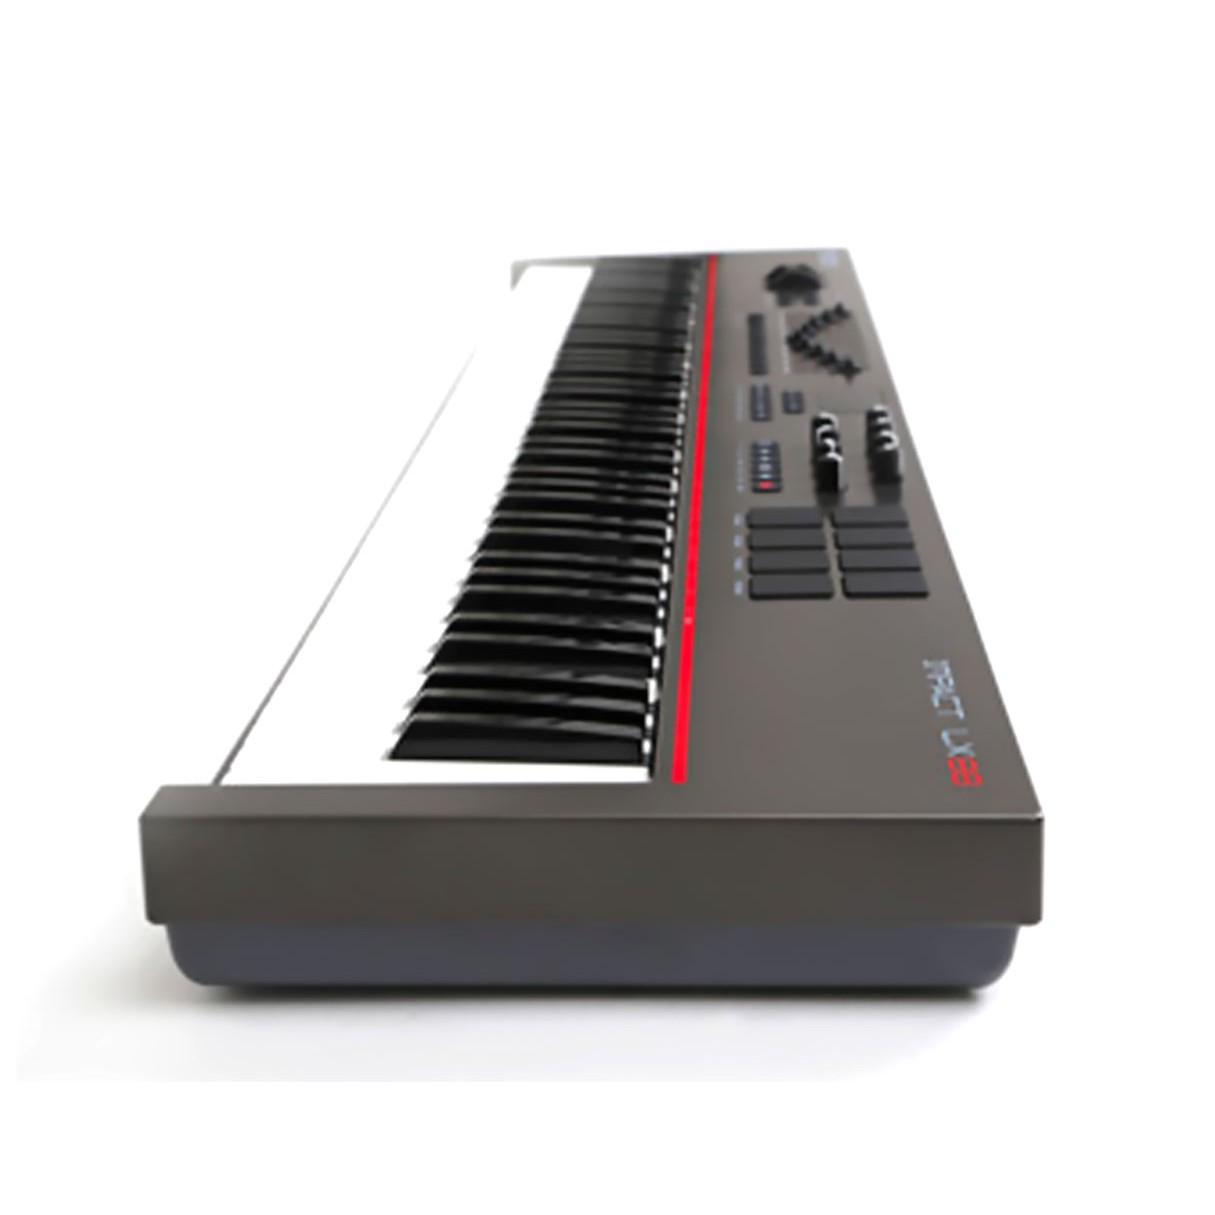 nektar technology lx88 88 key controller. Black Bedroom Furniture Sets. Home Design Ideas